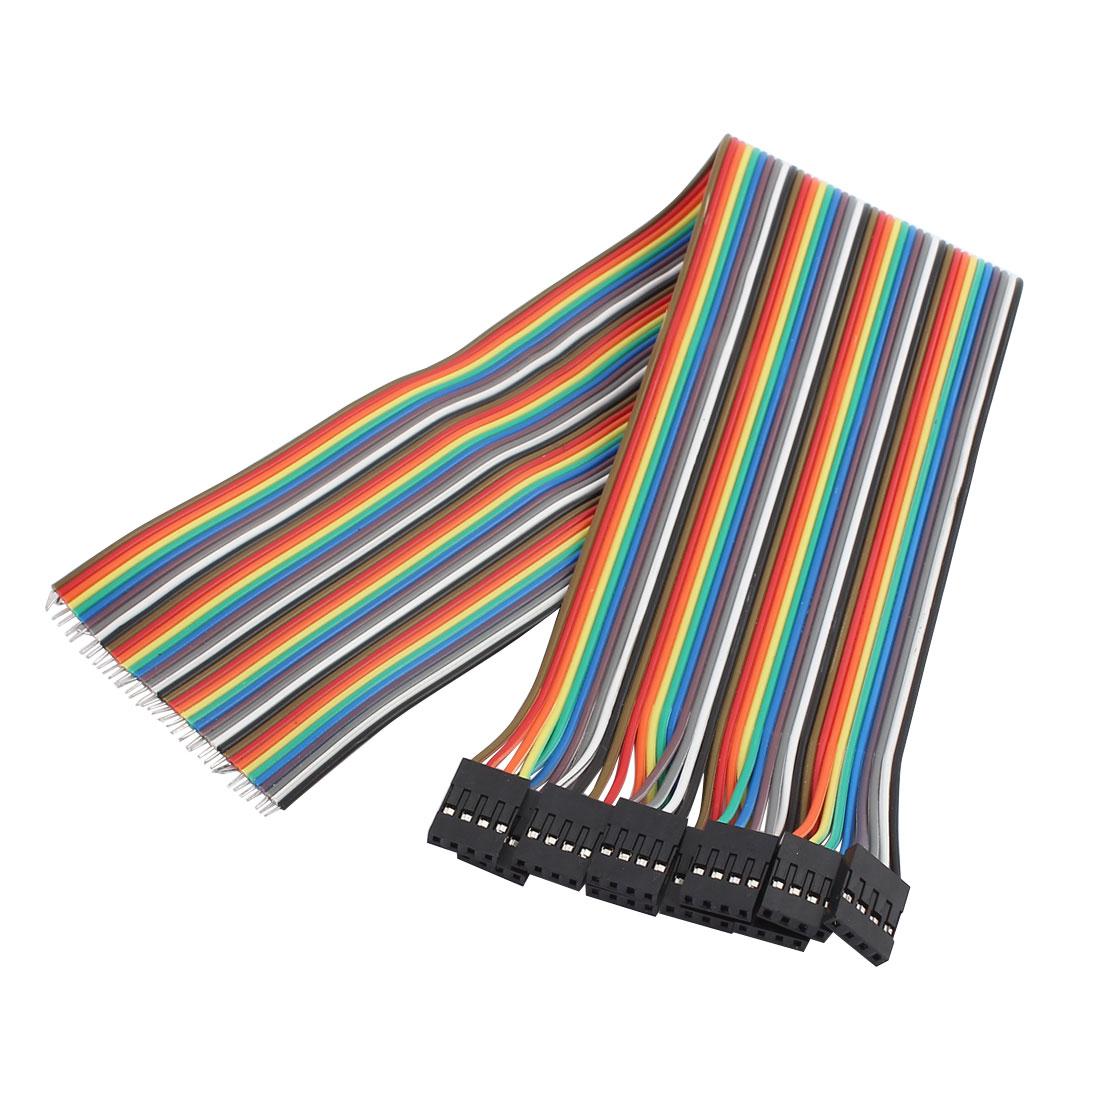 10Pcs 4P Jumper Wires Single Female Head Ribbon Cables Pi Pic Breadboard 30cm Long